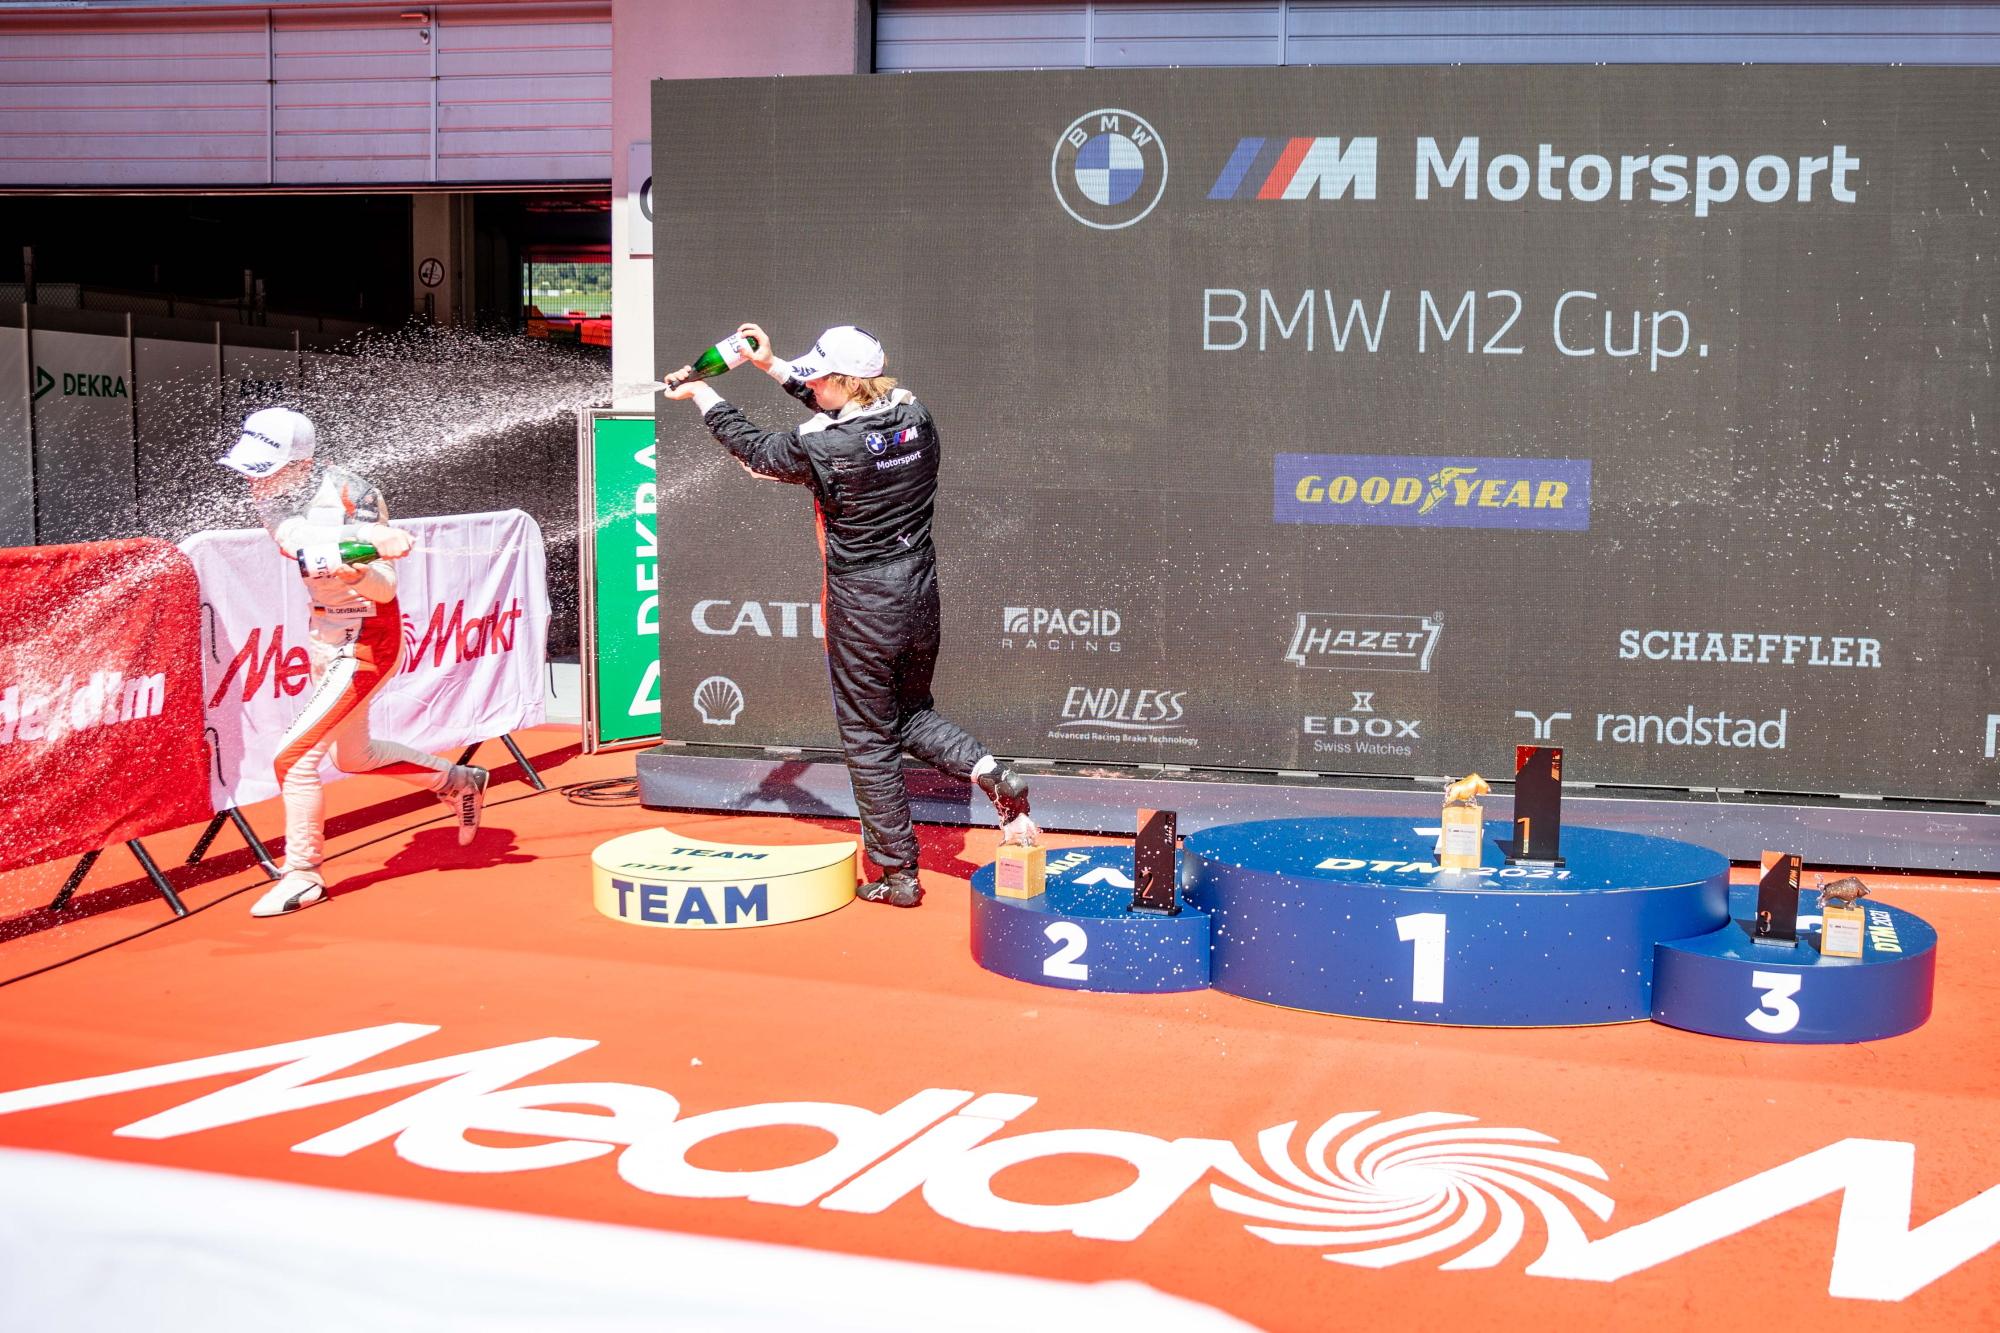 2021 09 04 BMWM2Cup RedBullRing Rennen1 Podium scaled 1